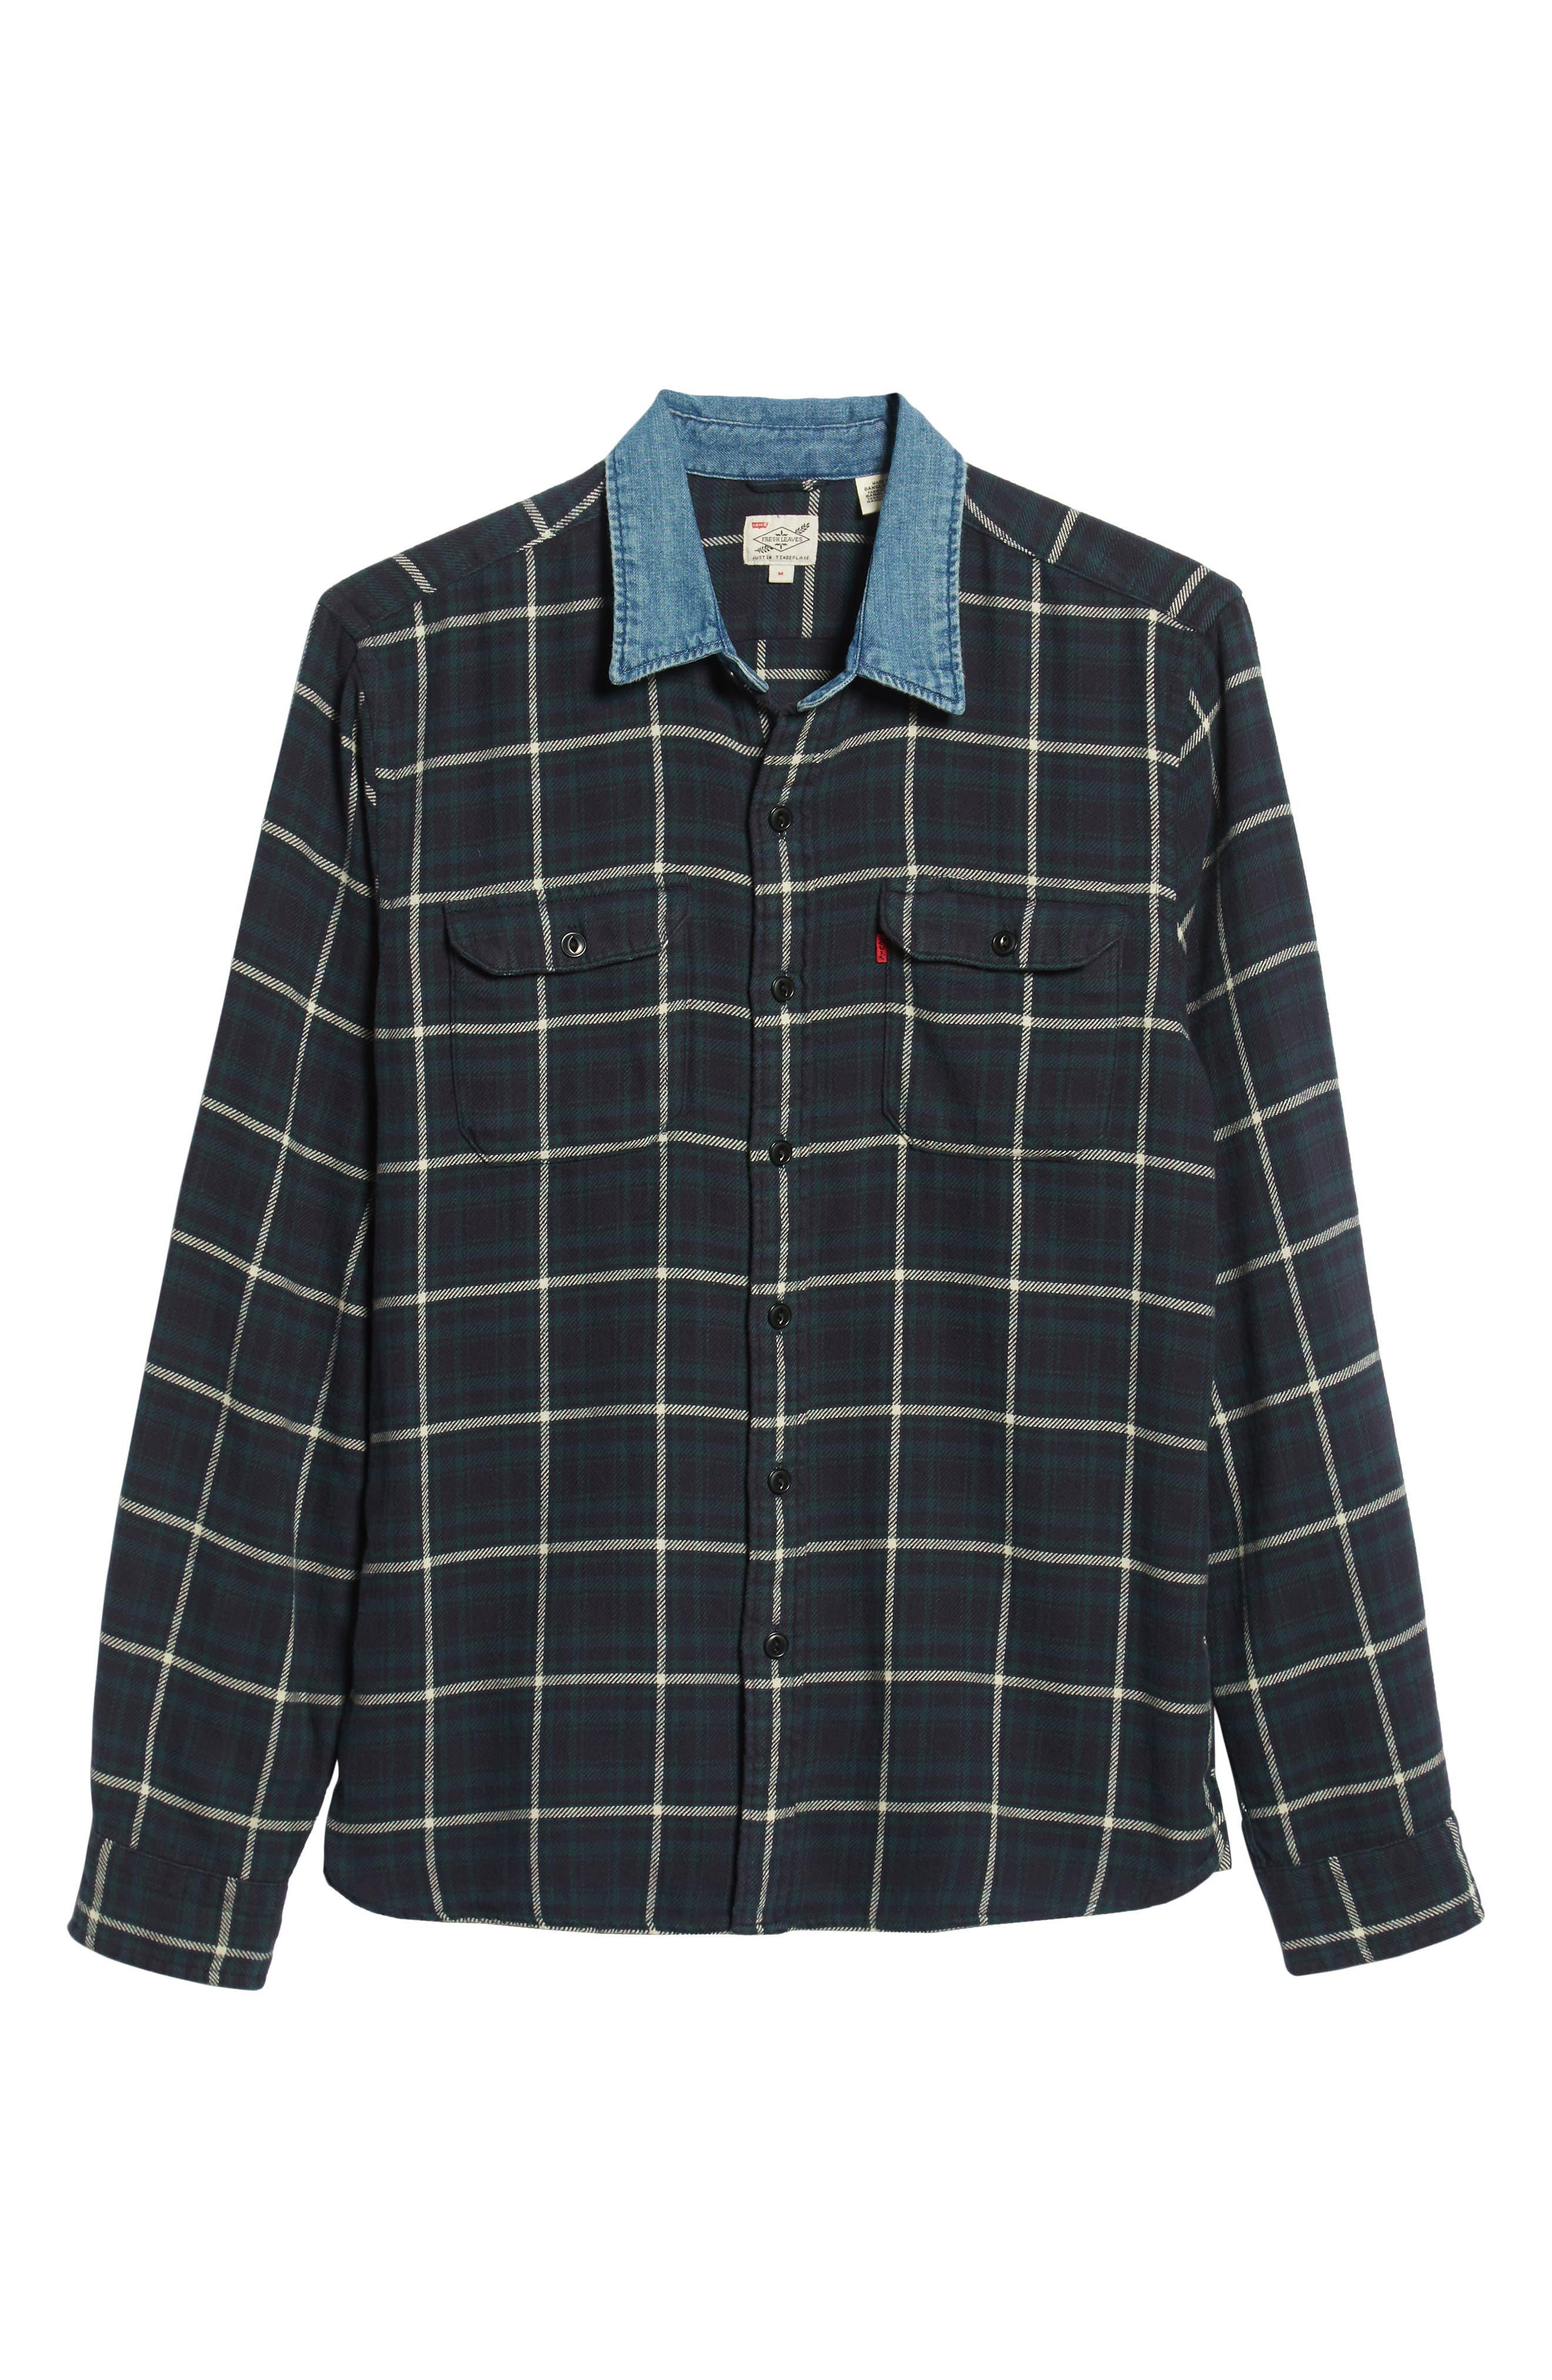 x Justin Timberlake Slim Fit Flannel Worker Shirt,                             Alternate thumbnail 7, color,                             HALLET NIGHT SKY